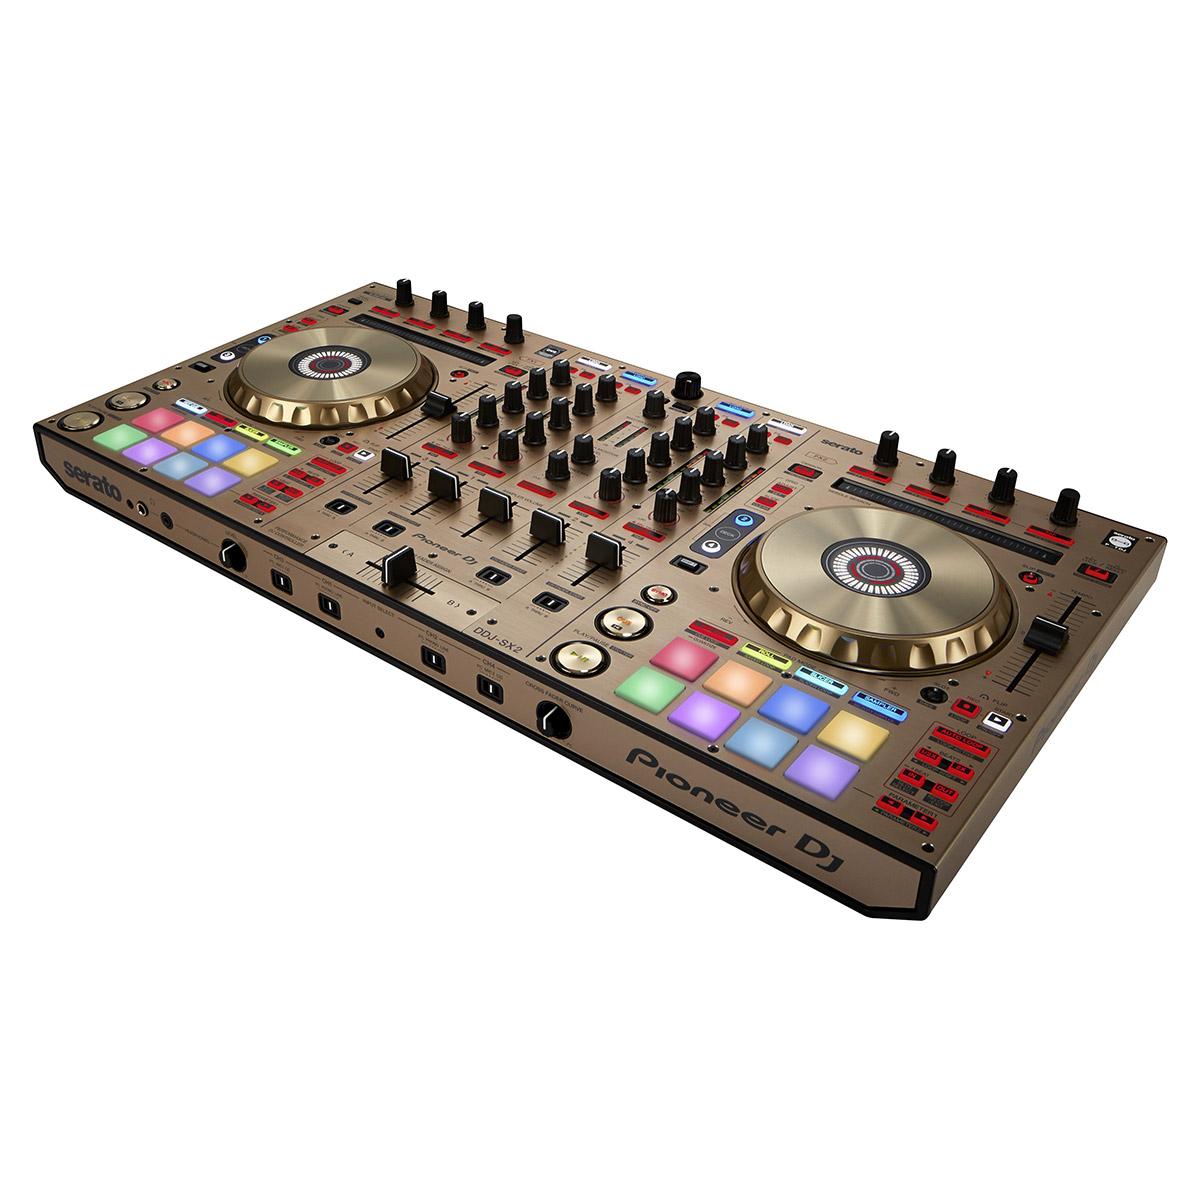 Contrôleur DJ USB Pioneer DJ - DDJ SX 2 N (Edition Limitée)